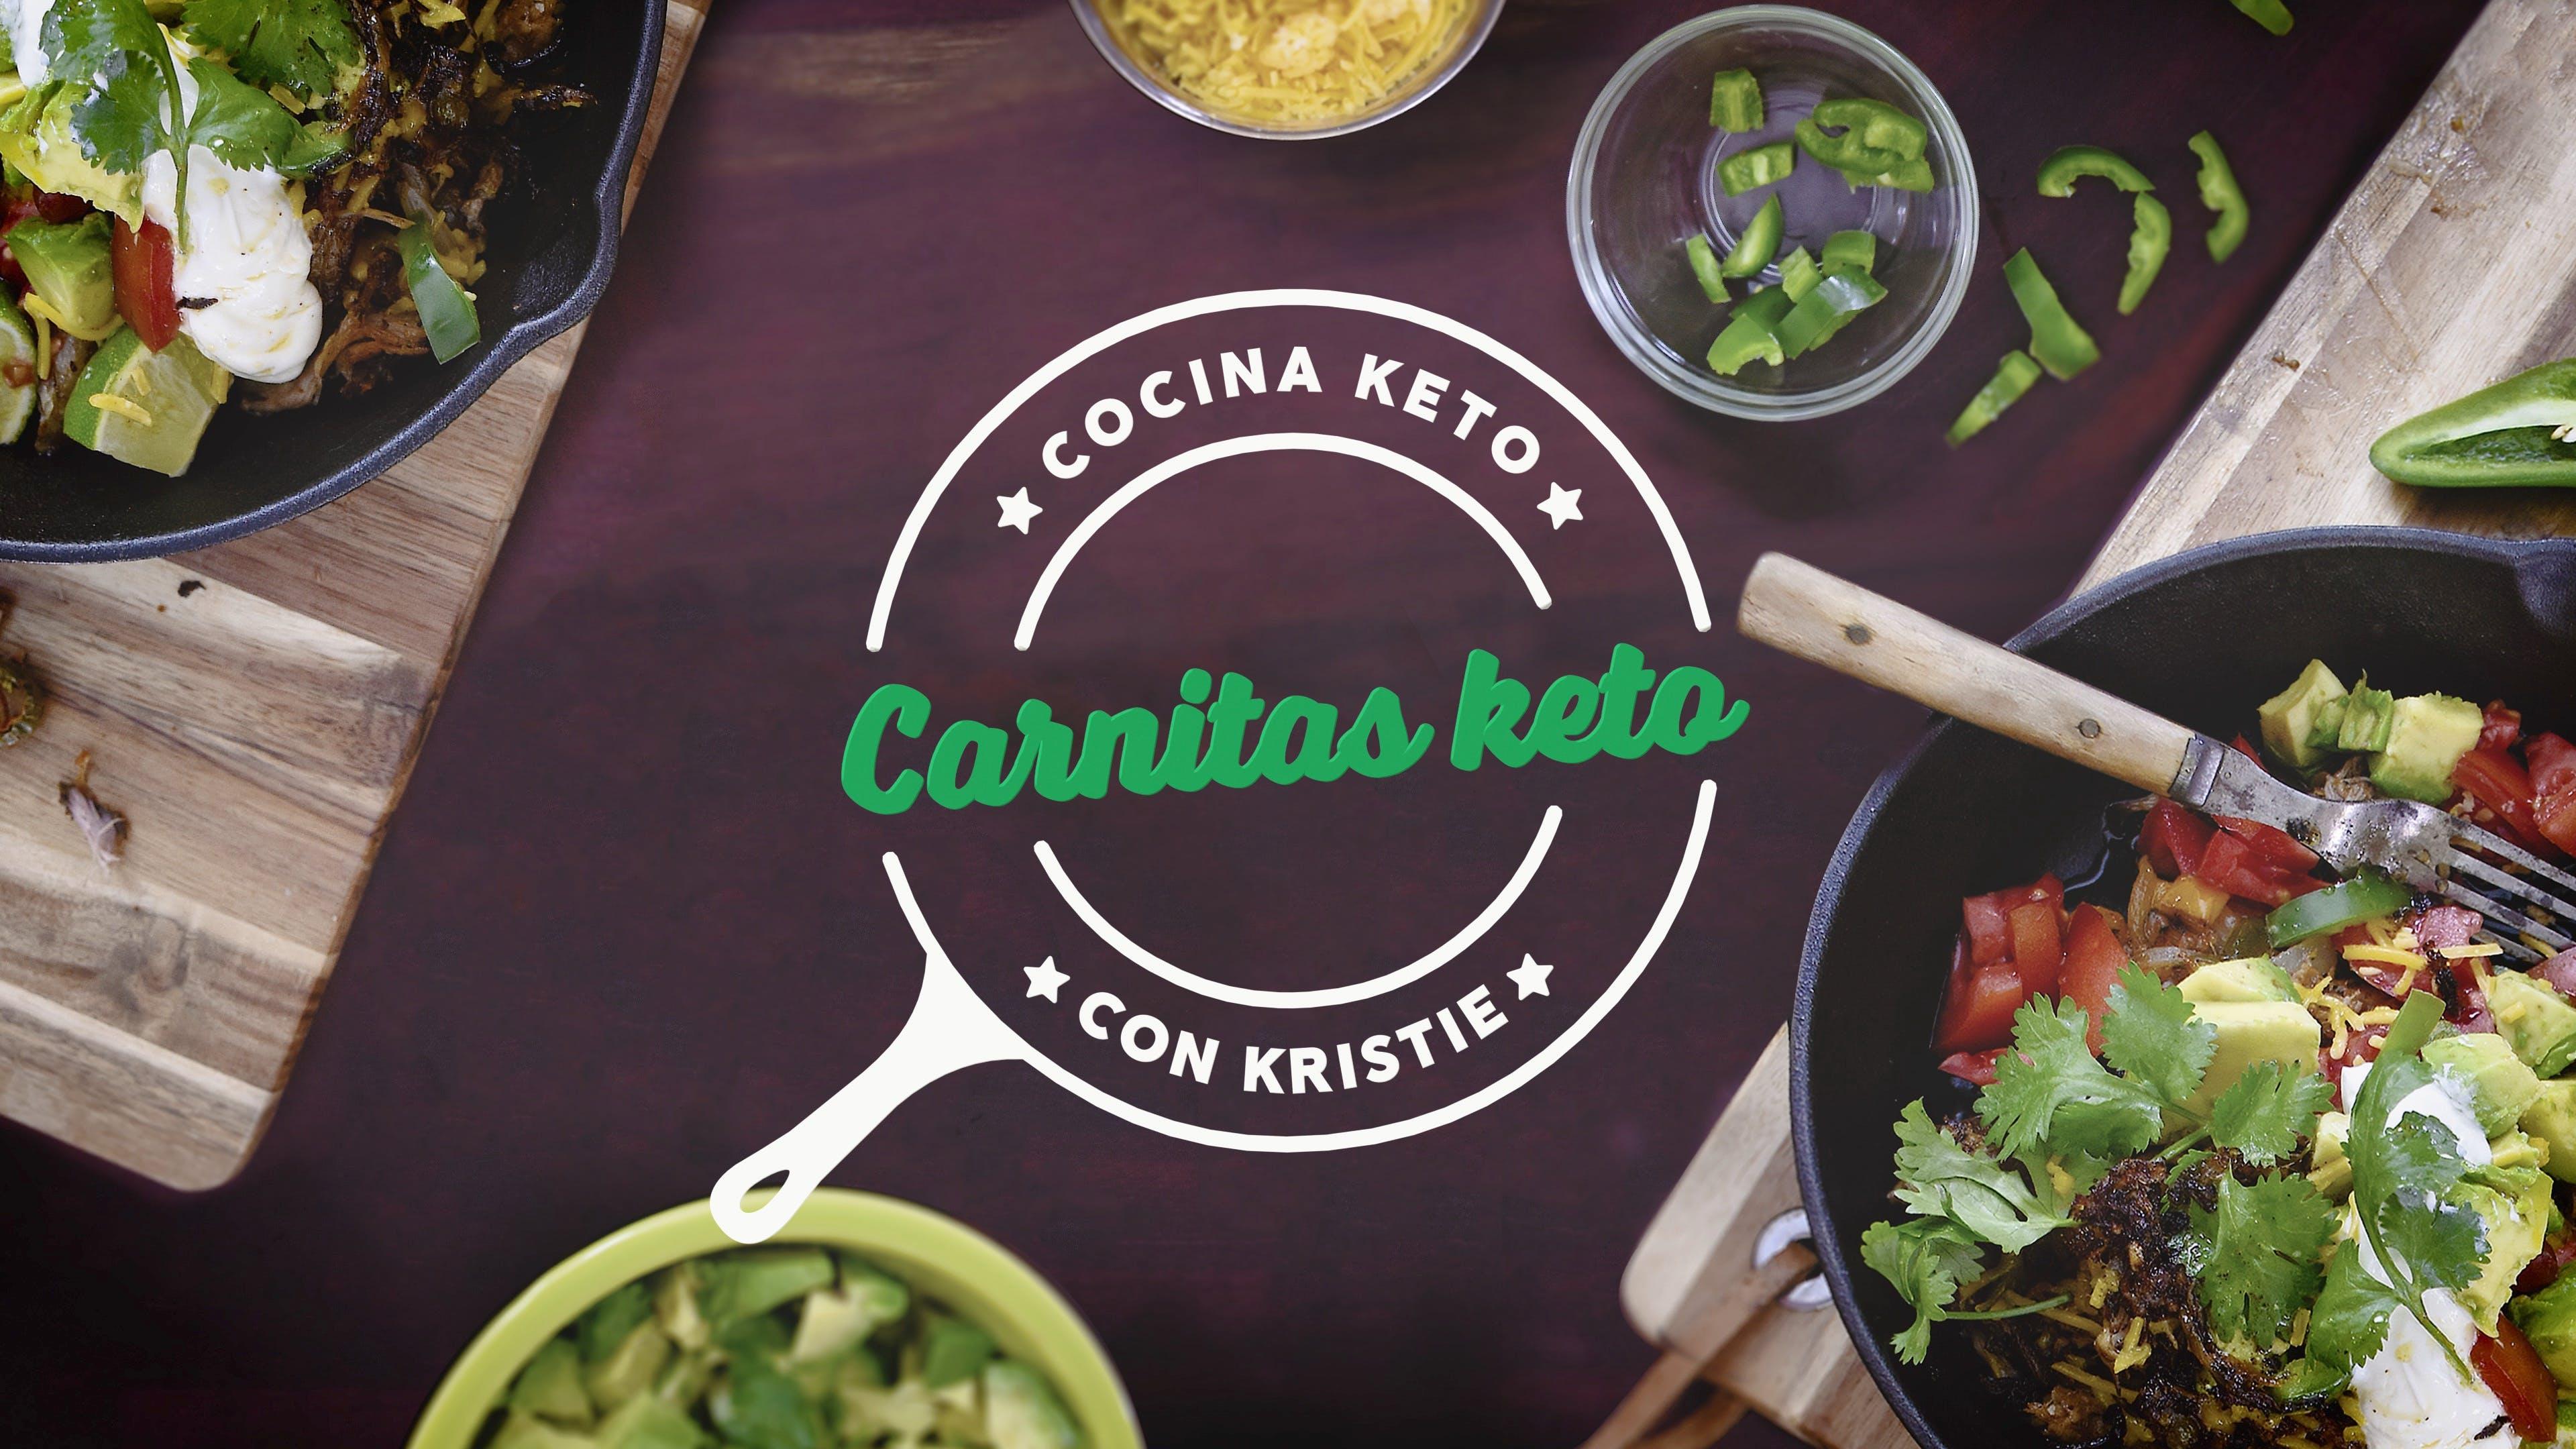 Cocina keto con Kristie - Carnitas keto